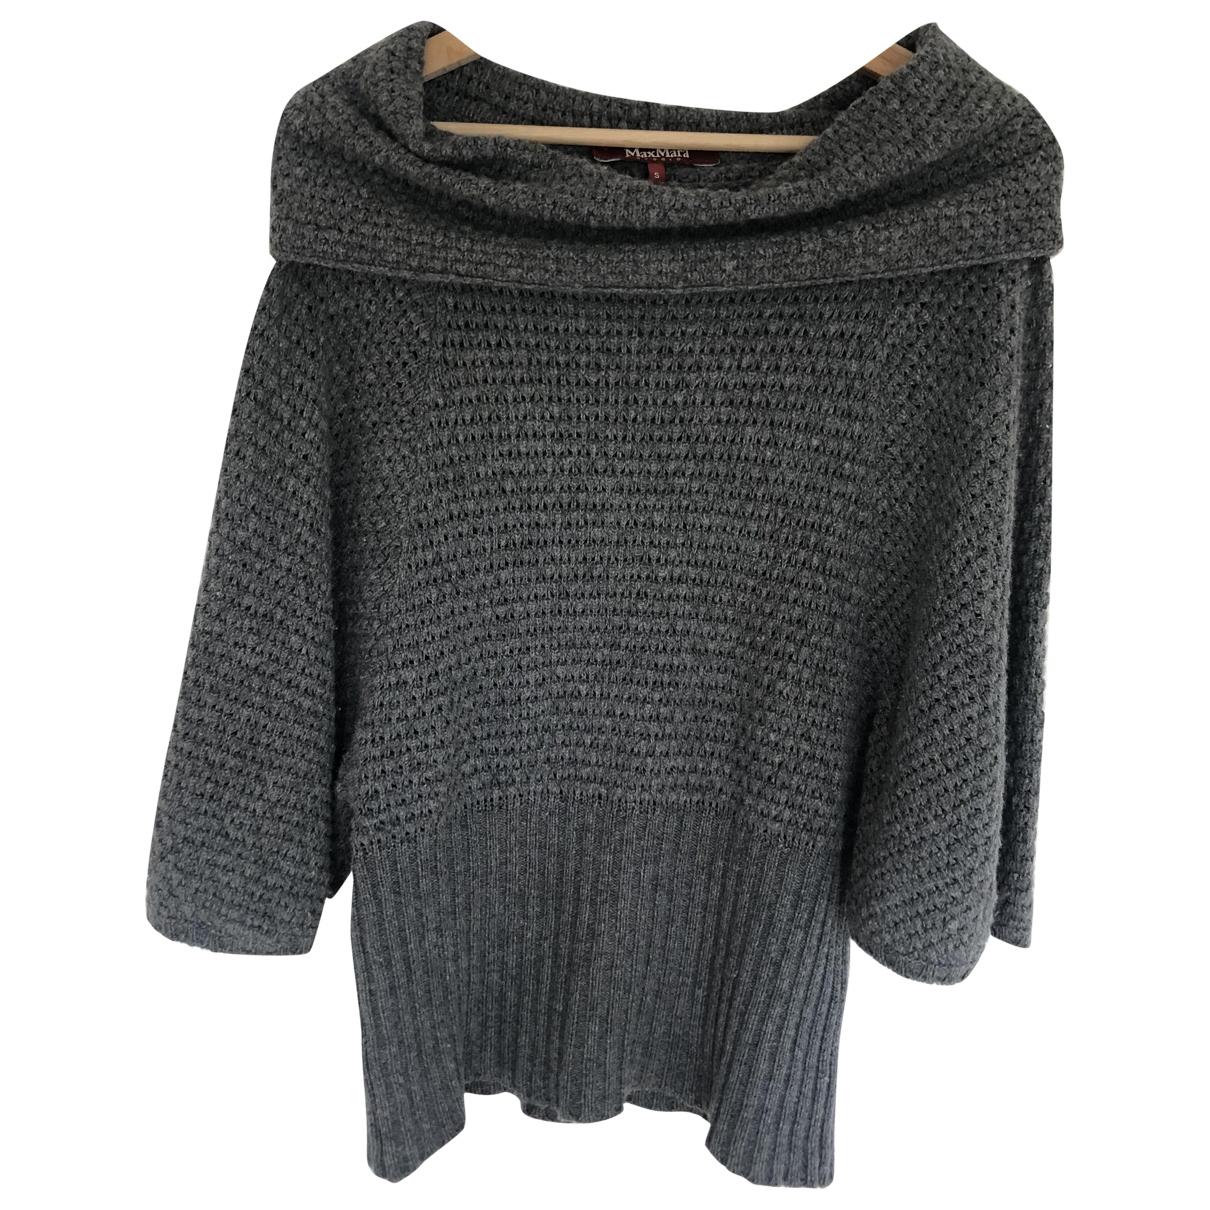 Max Mara Studio \N Grey Wool Knitwear for Women S International